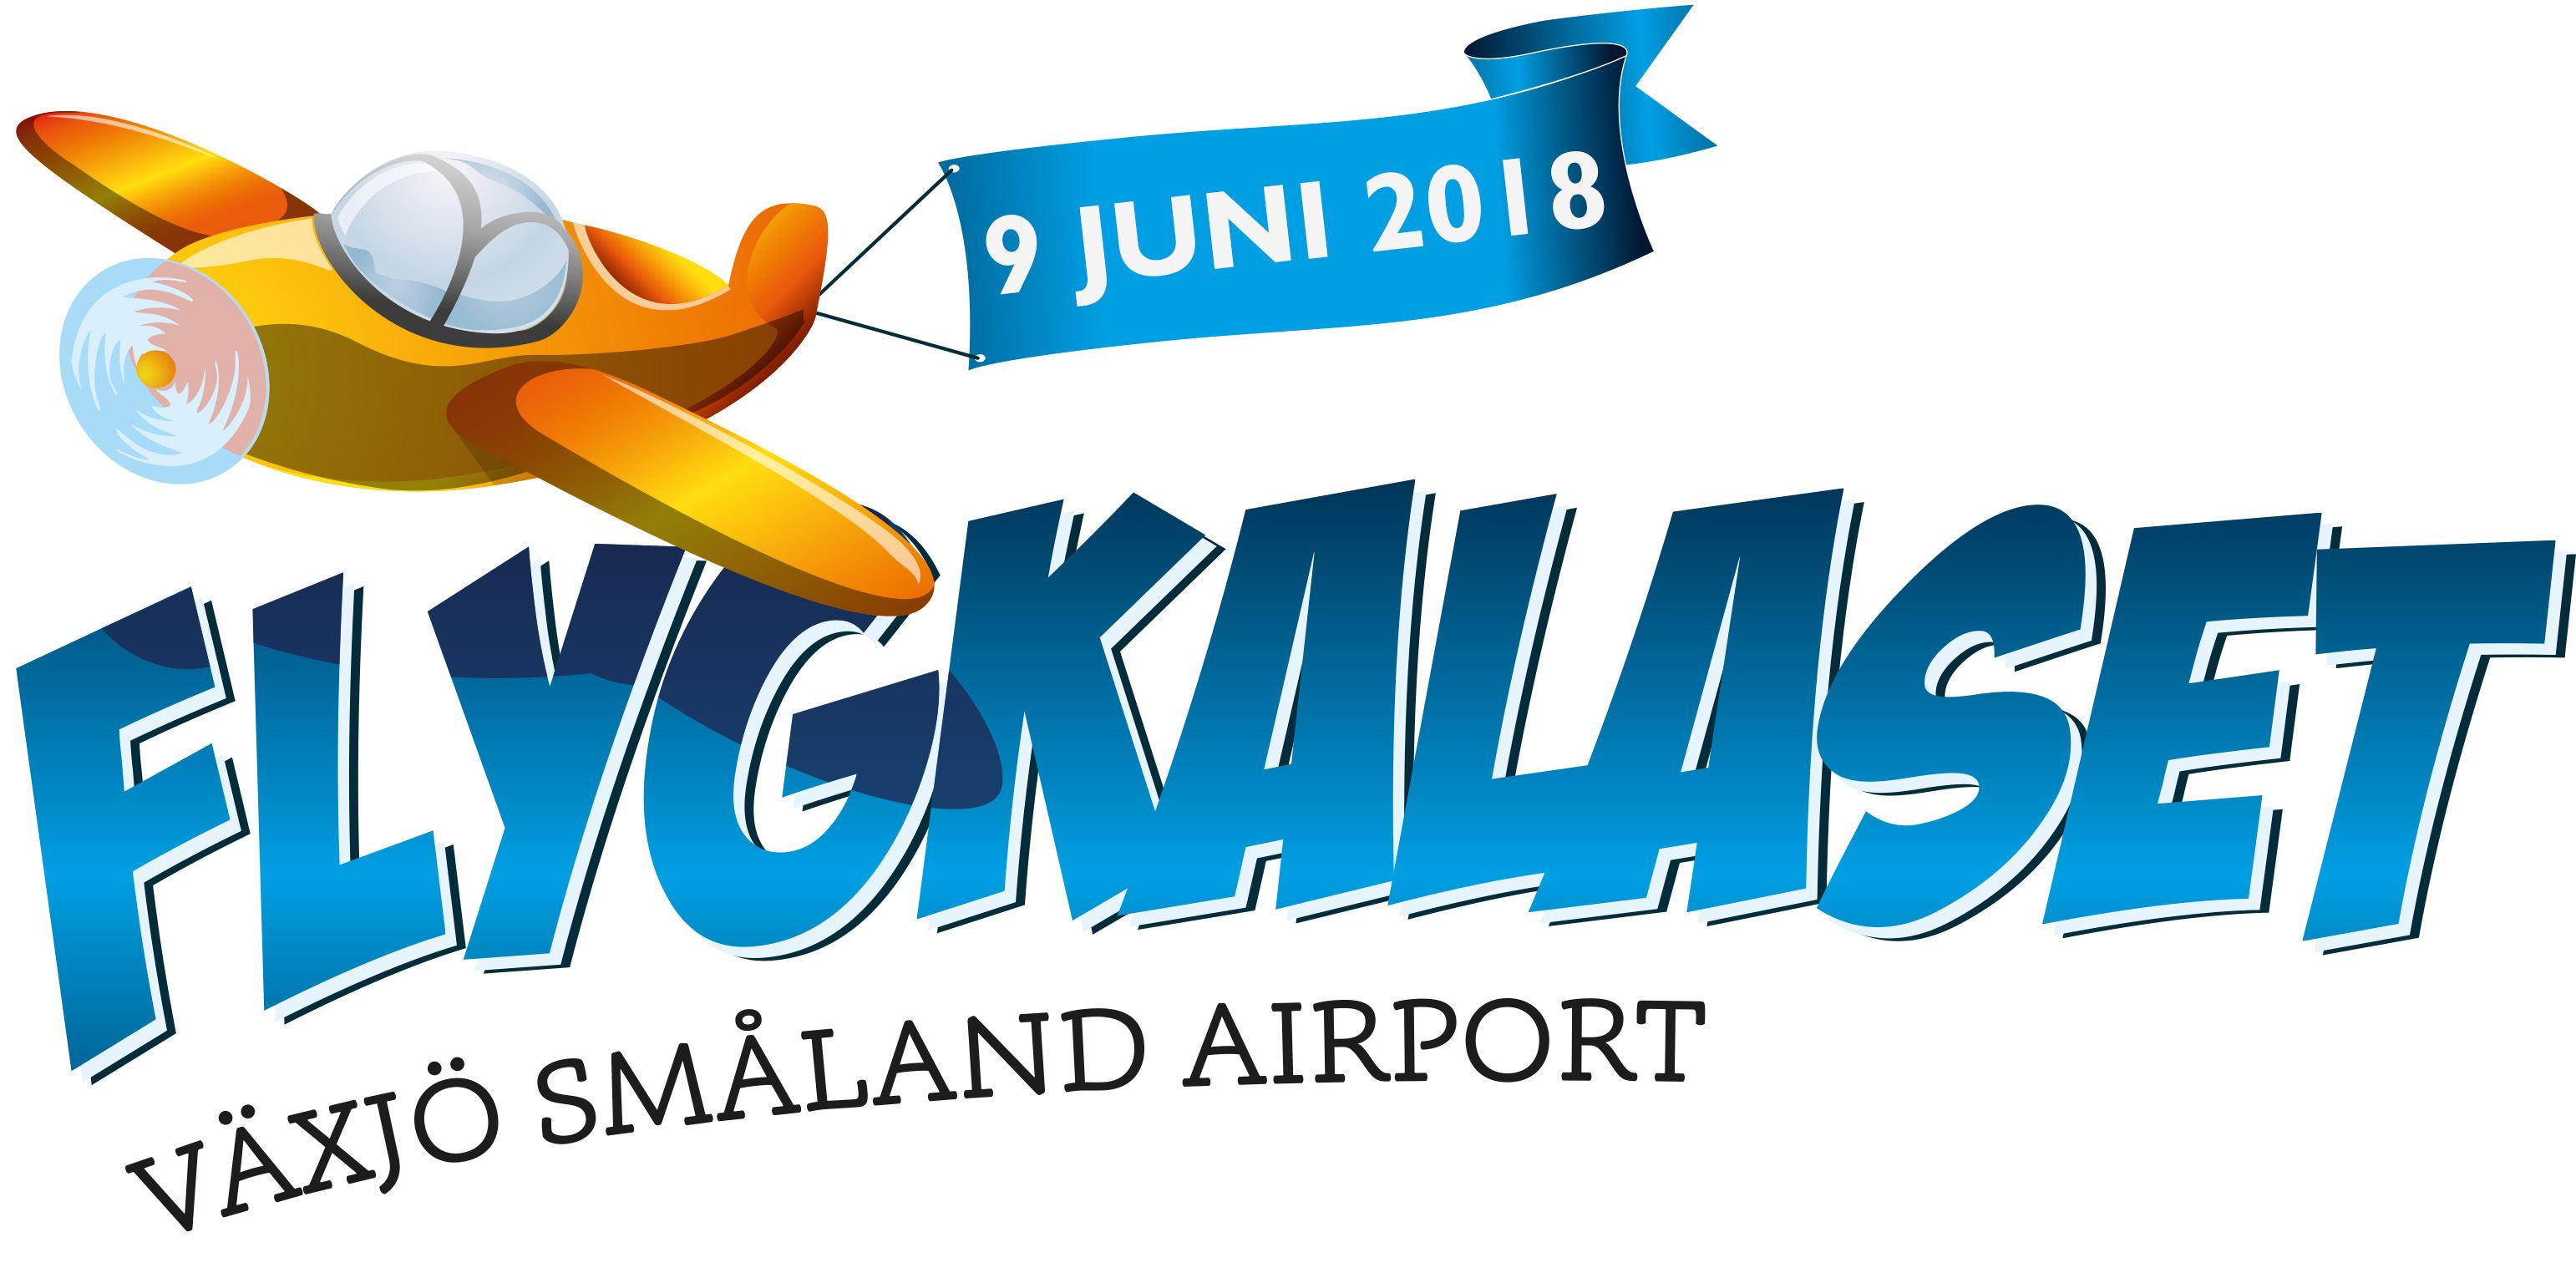 Flygkalaset 2018-Växjö Småland Airport